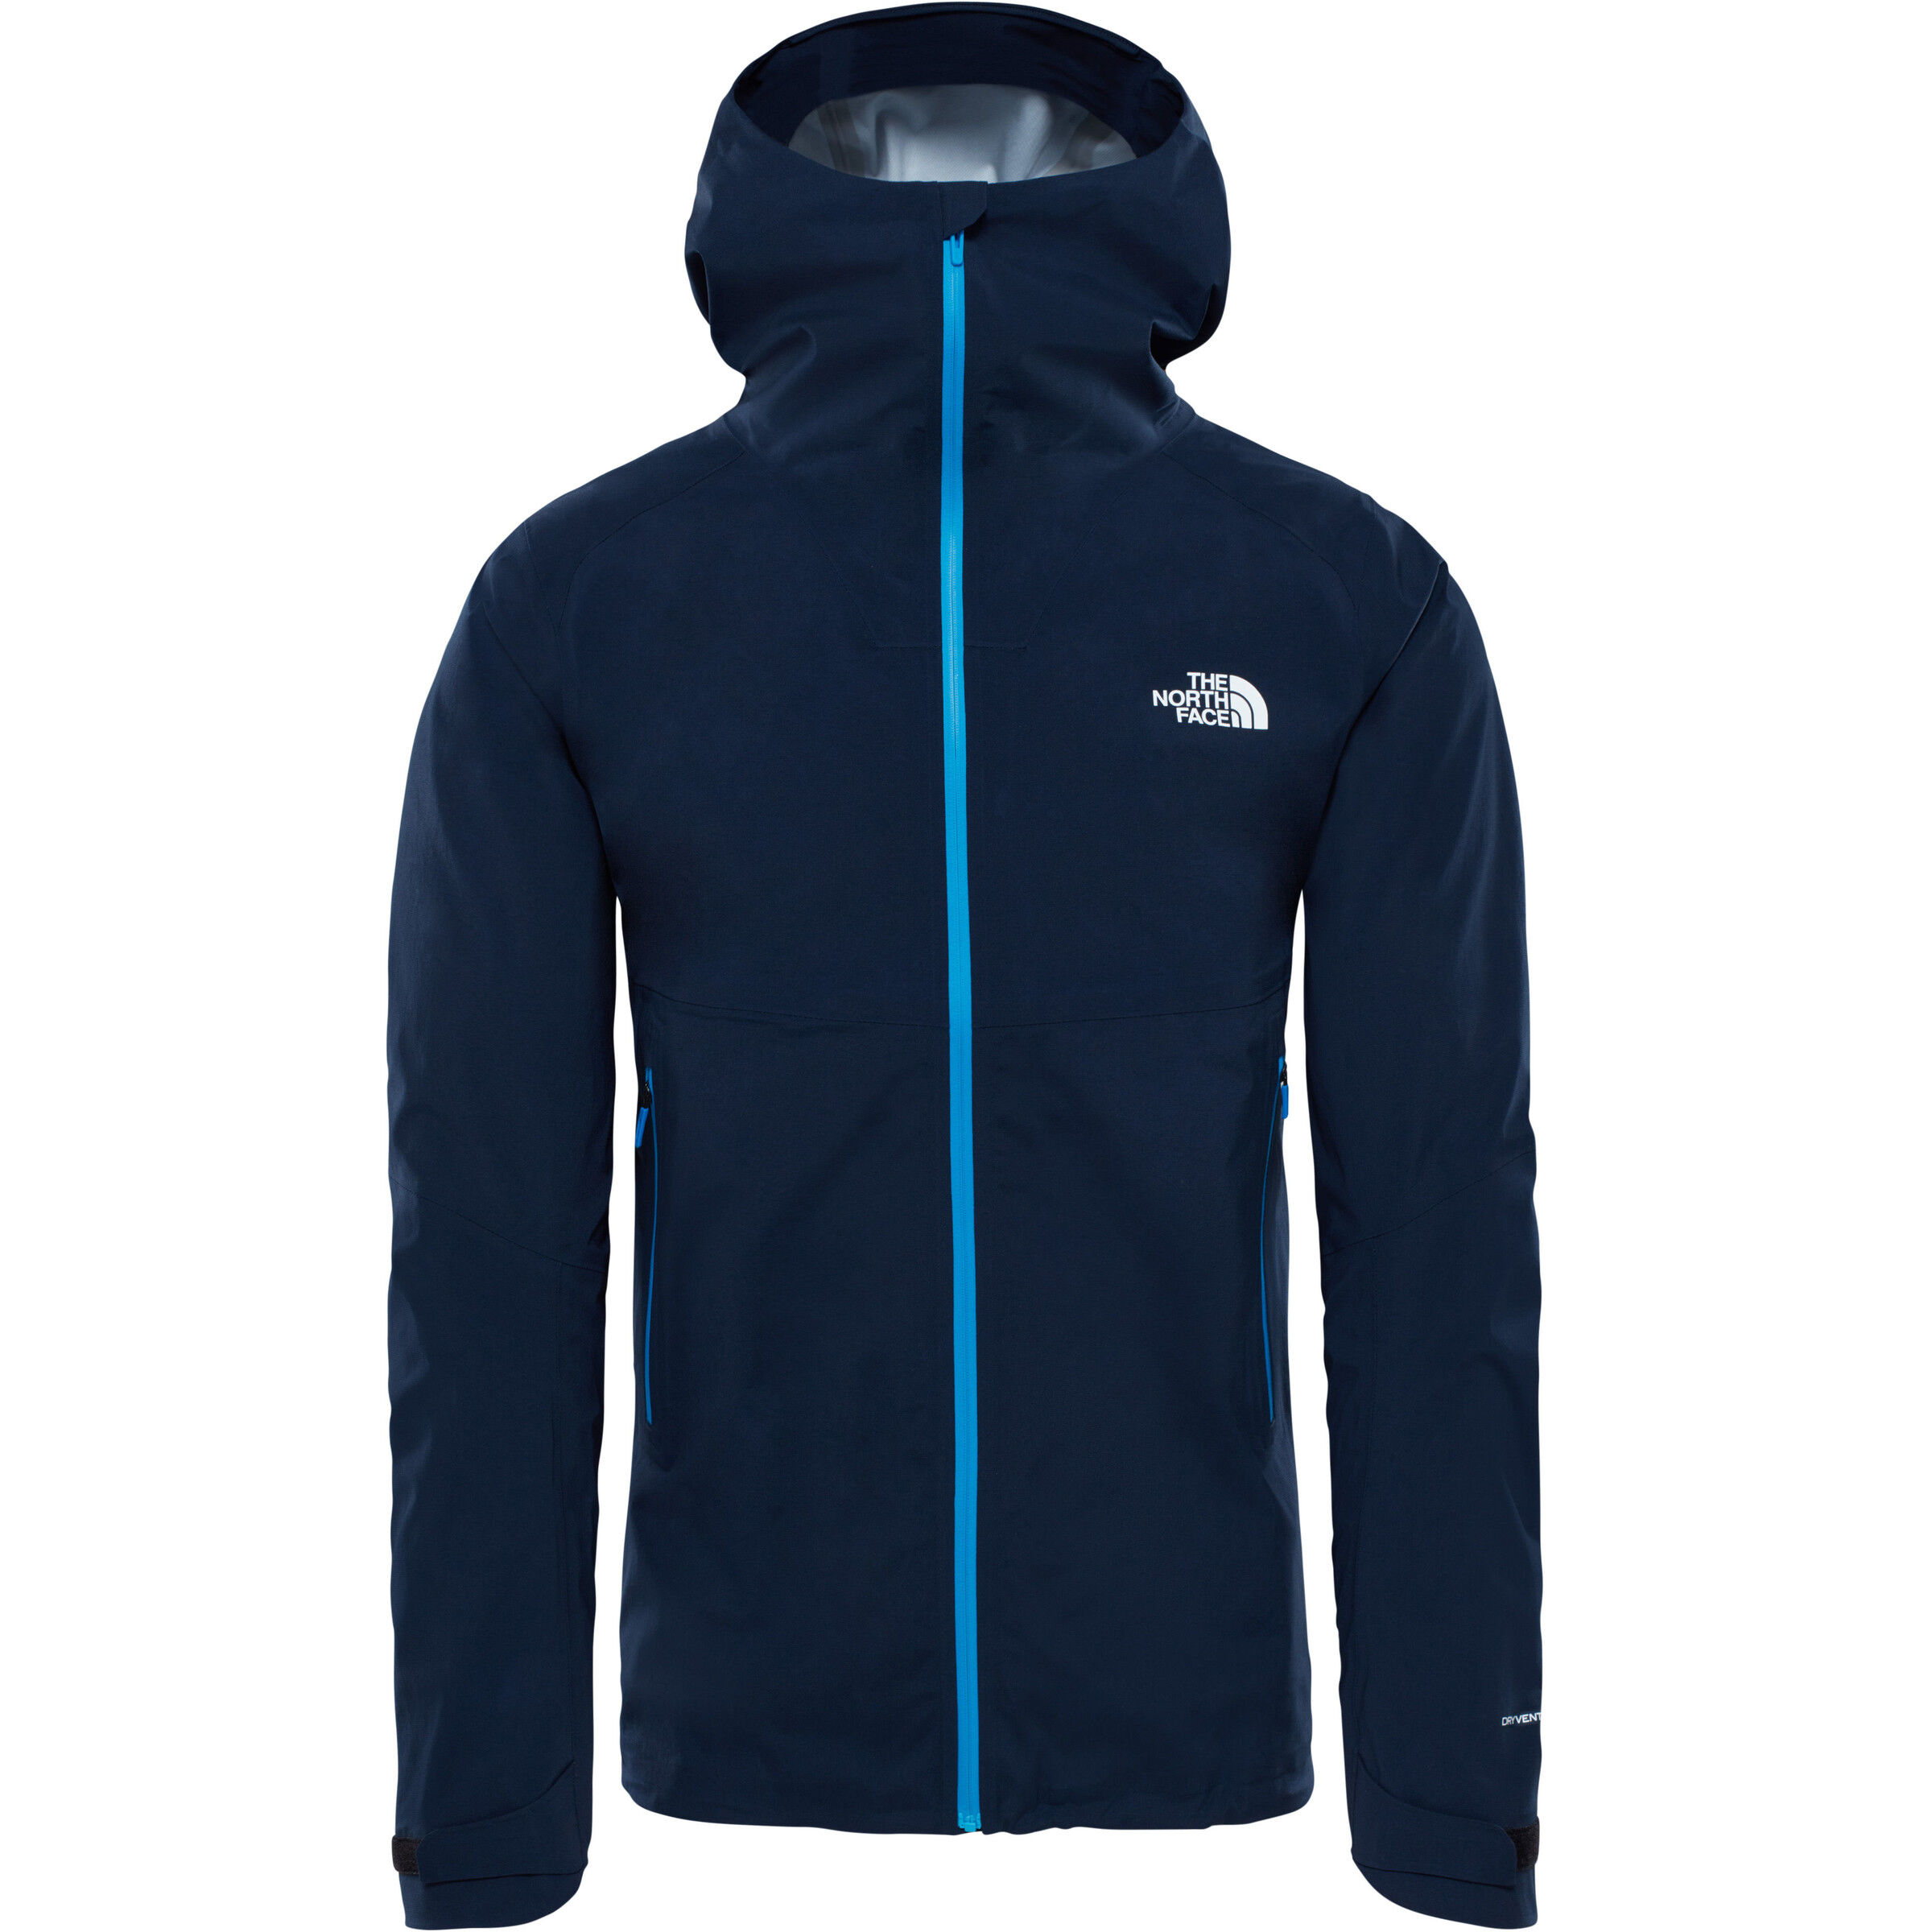 SALEWA PEDROC PTC Alpha Jacket Men royal blue8670 2017